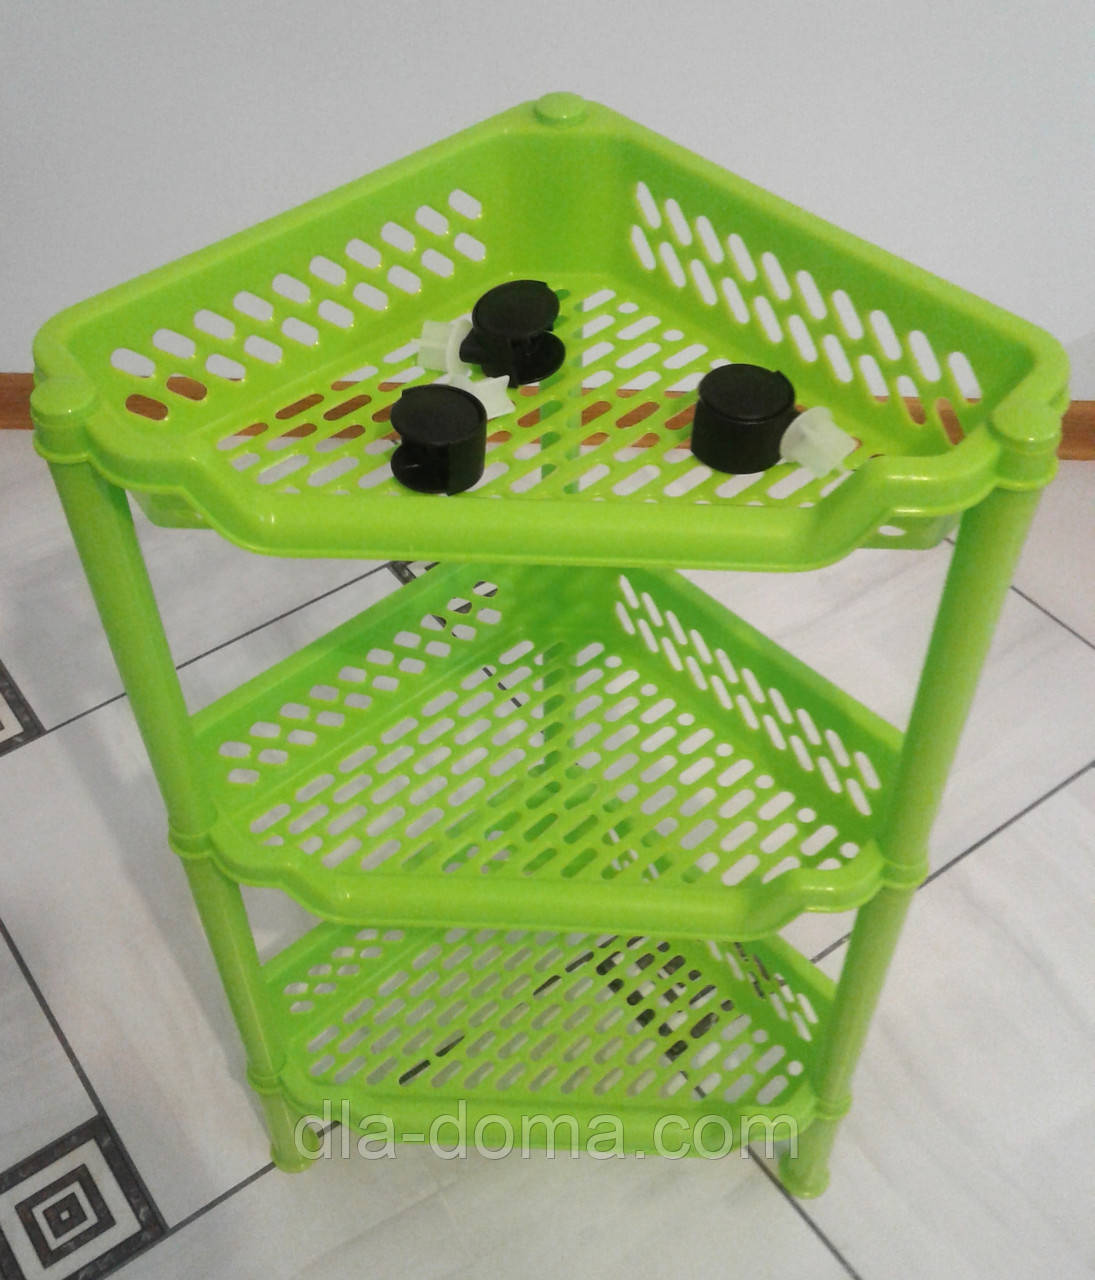 Этажерка пластиковая угловая салатовая